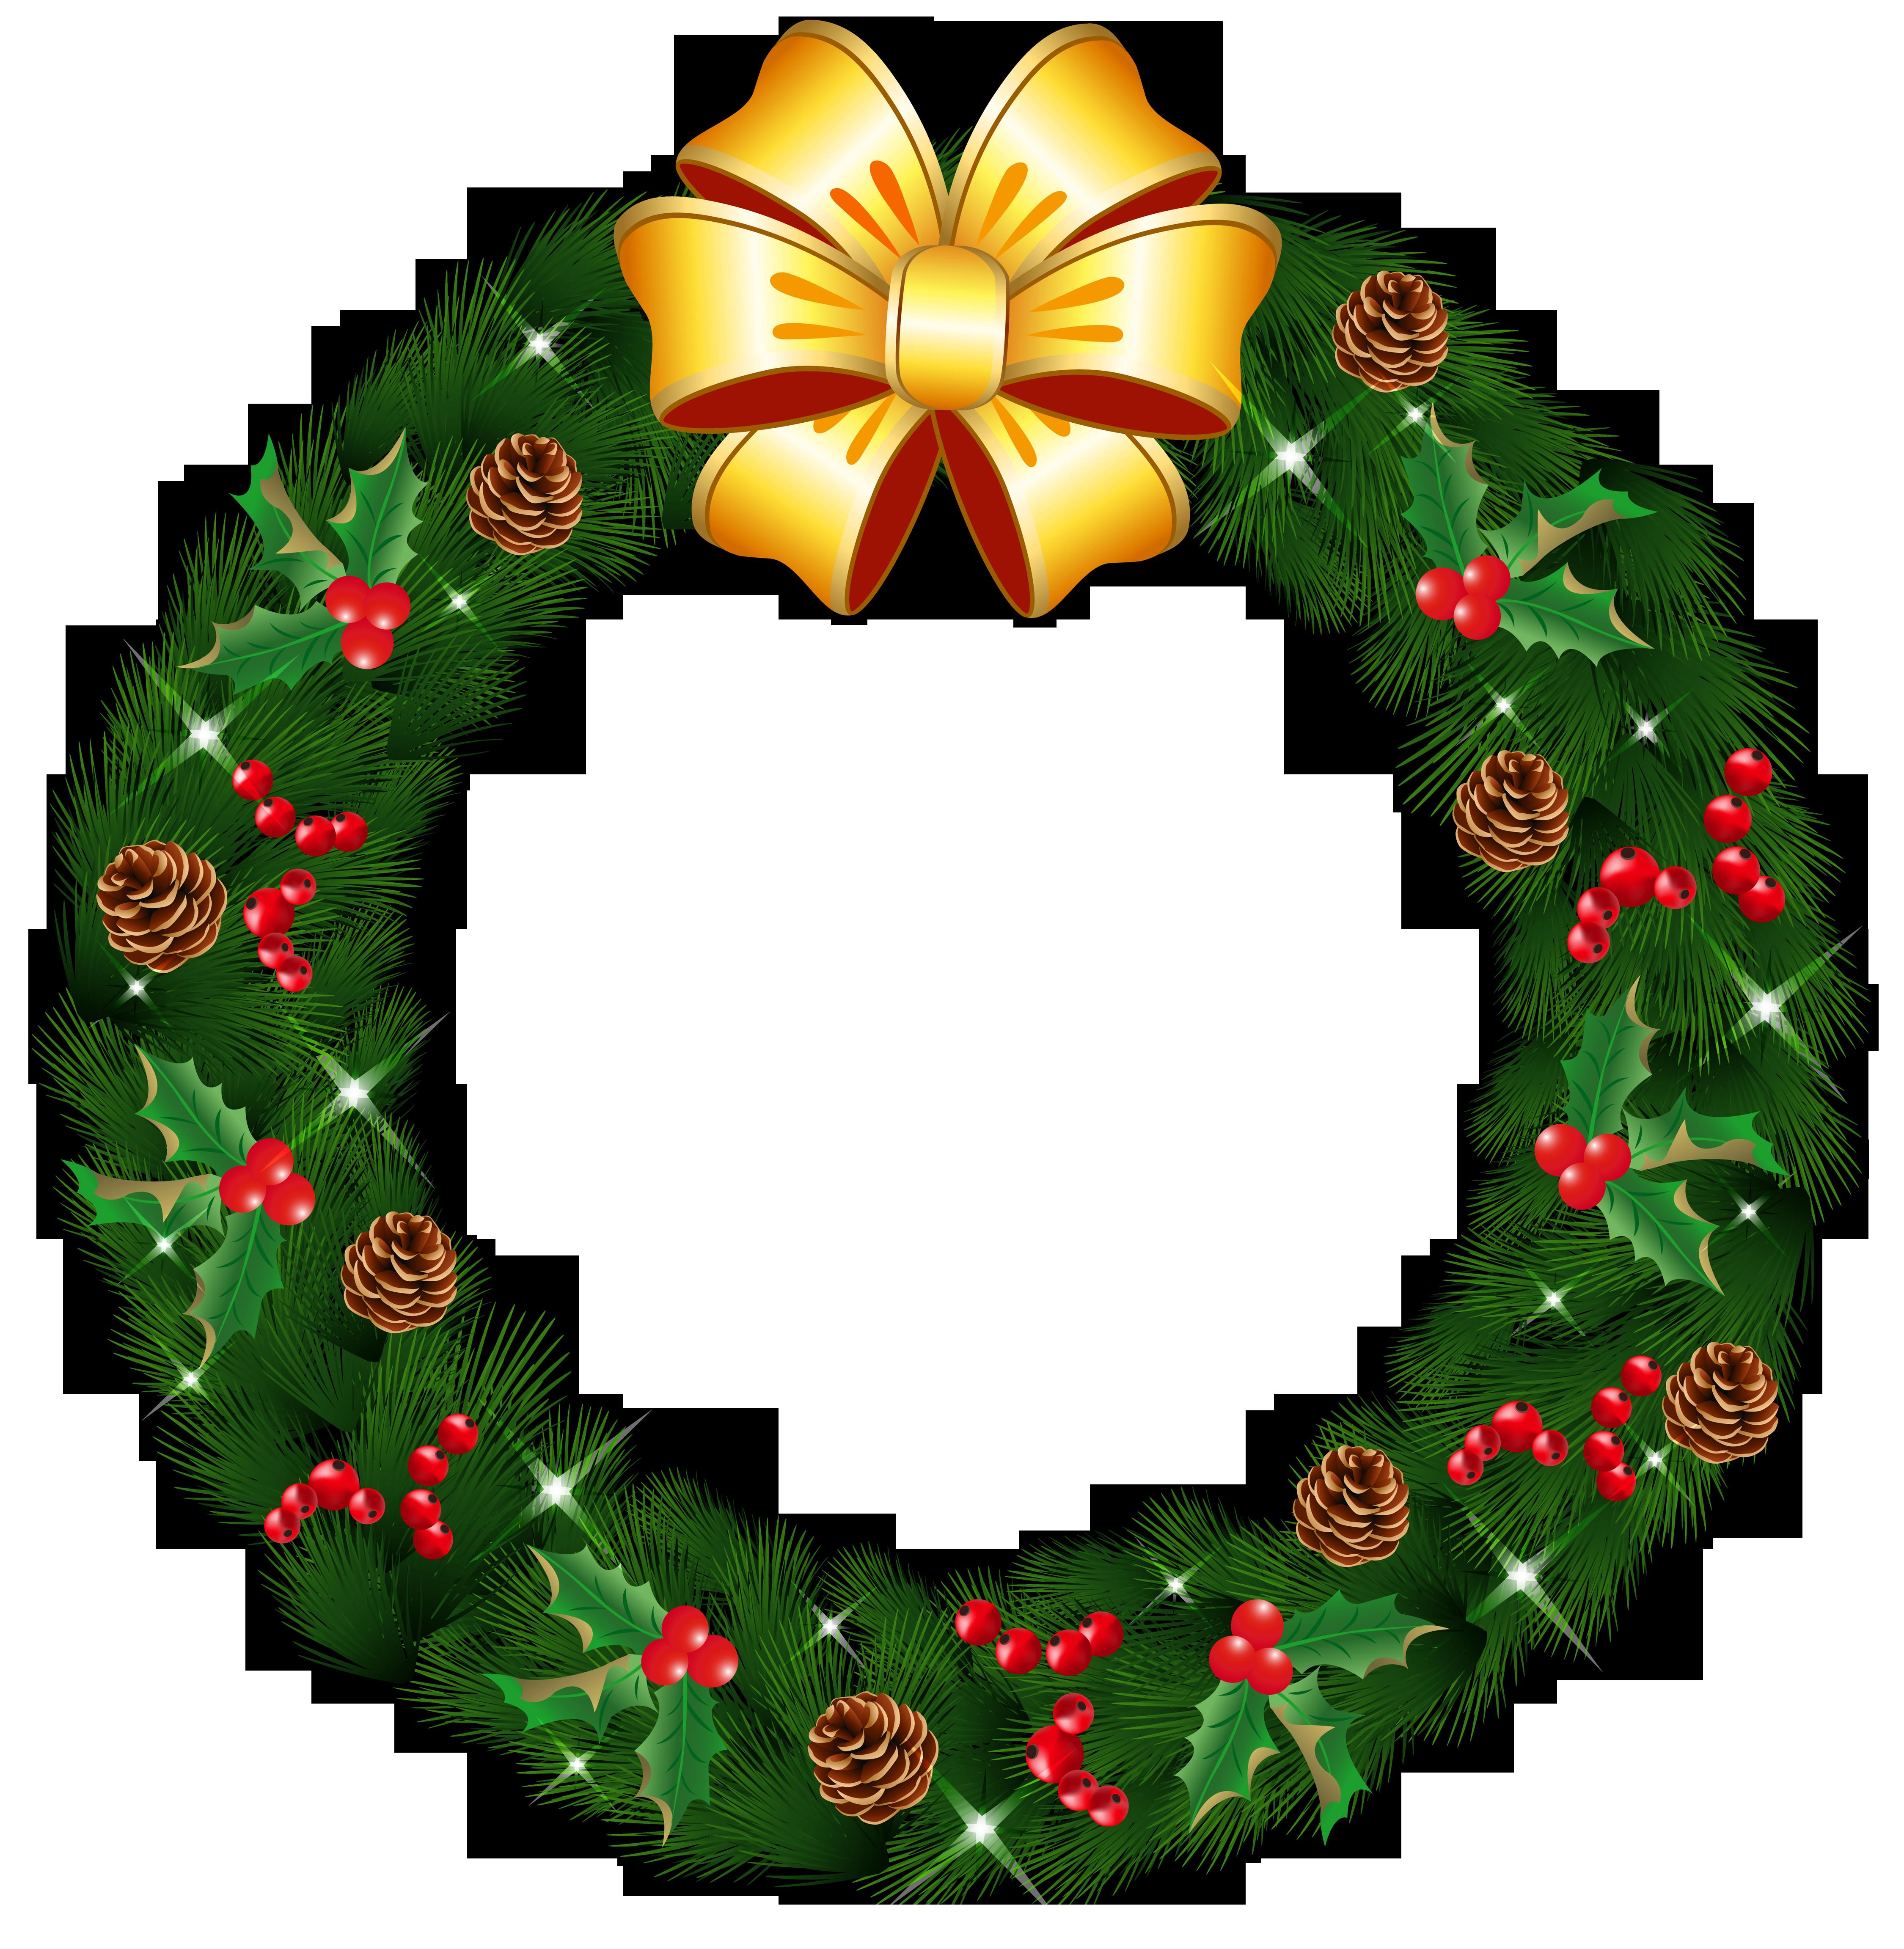 Free PNG HD Christmas Wreath - 126838